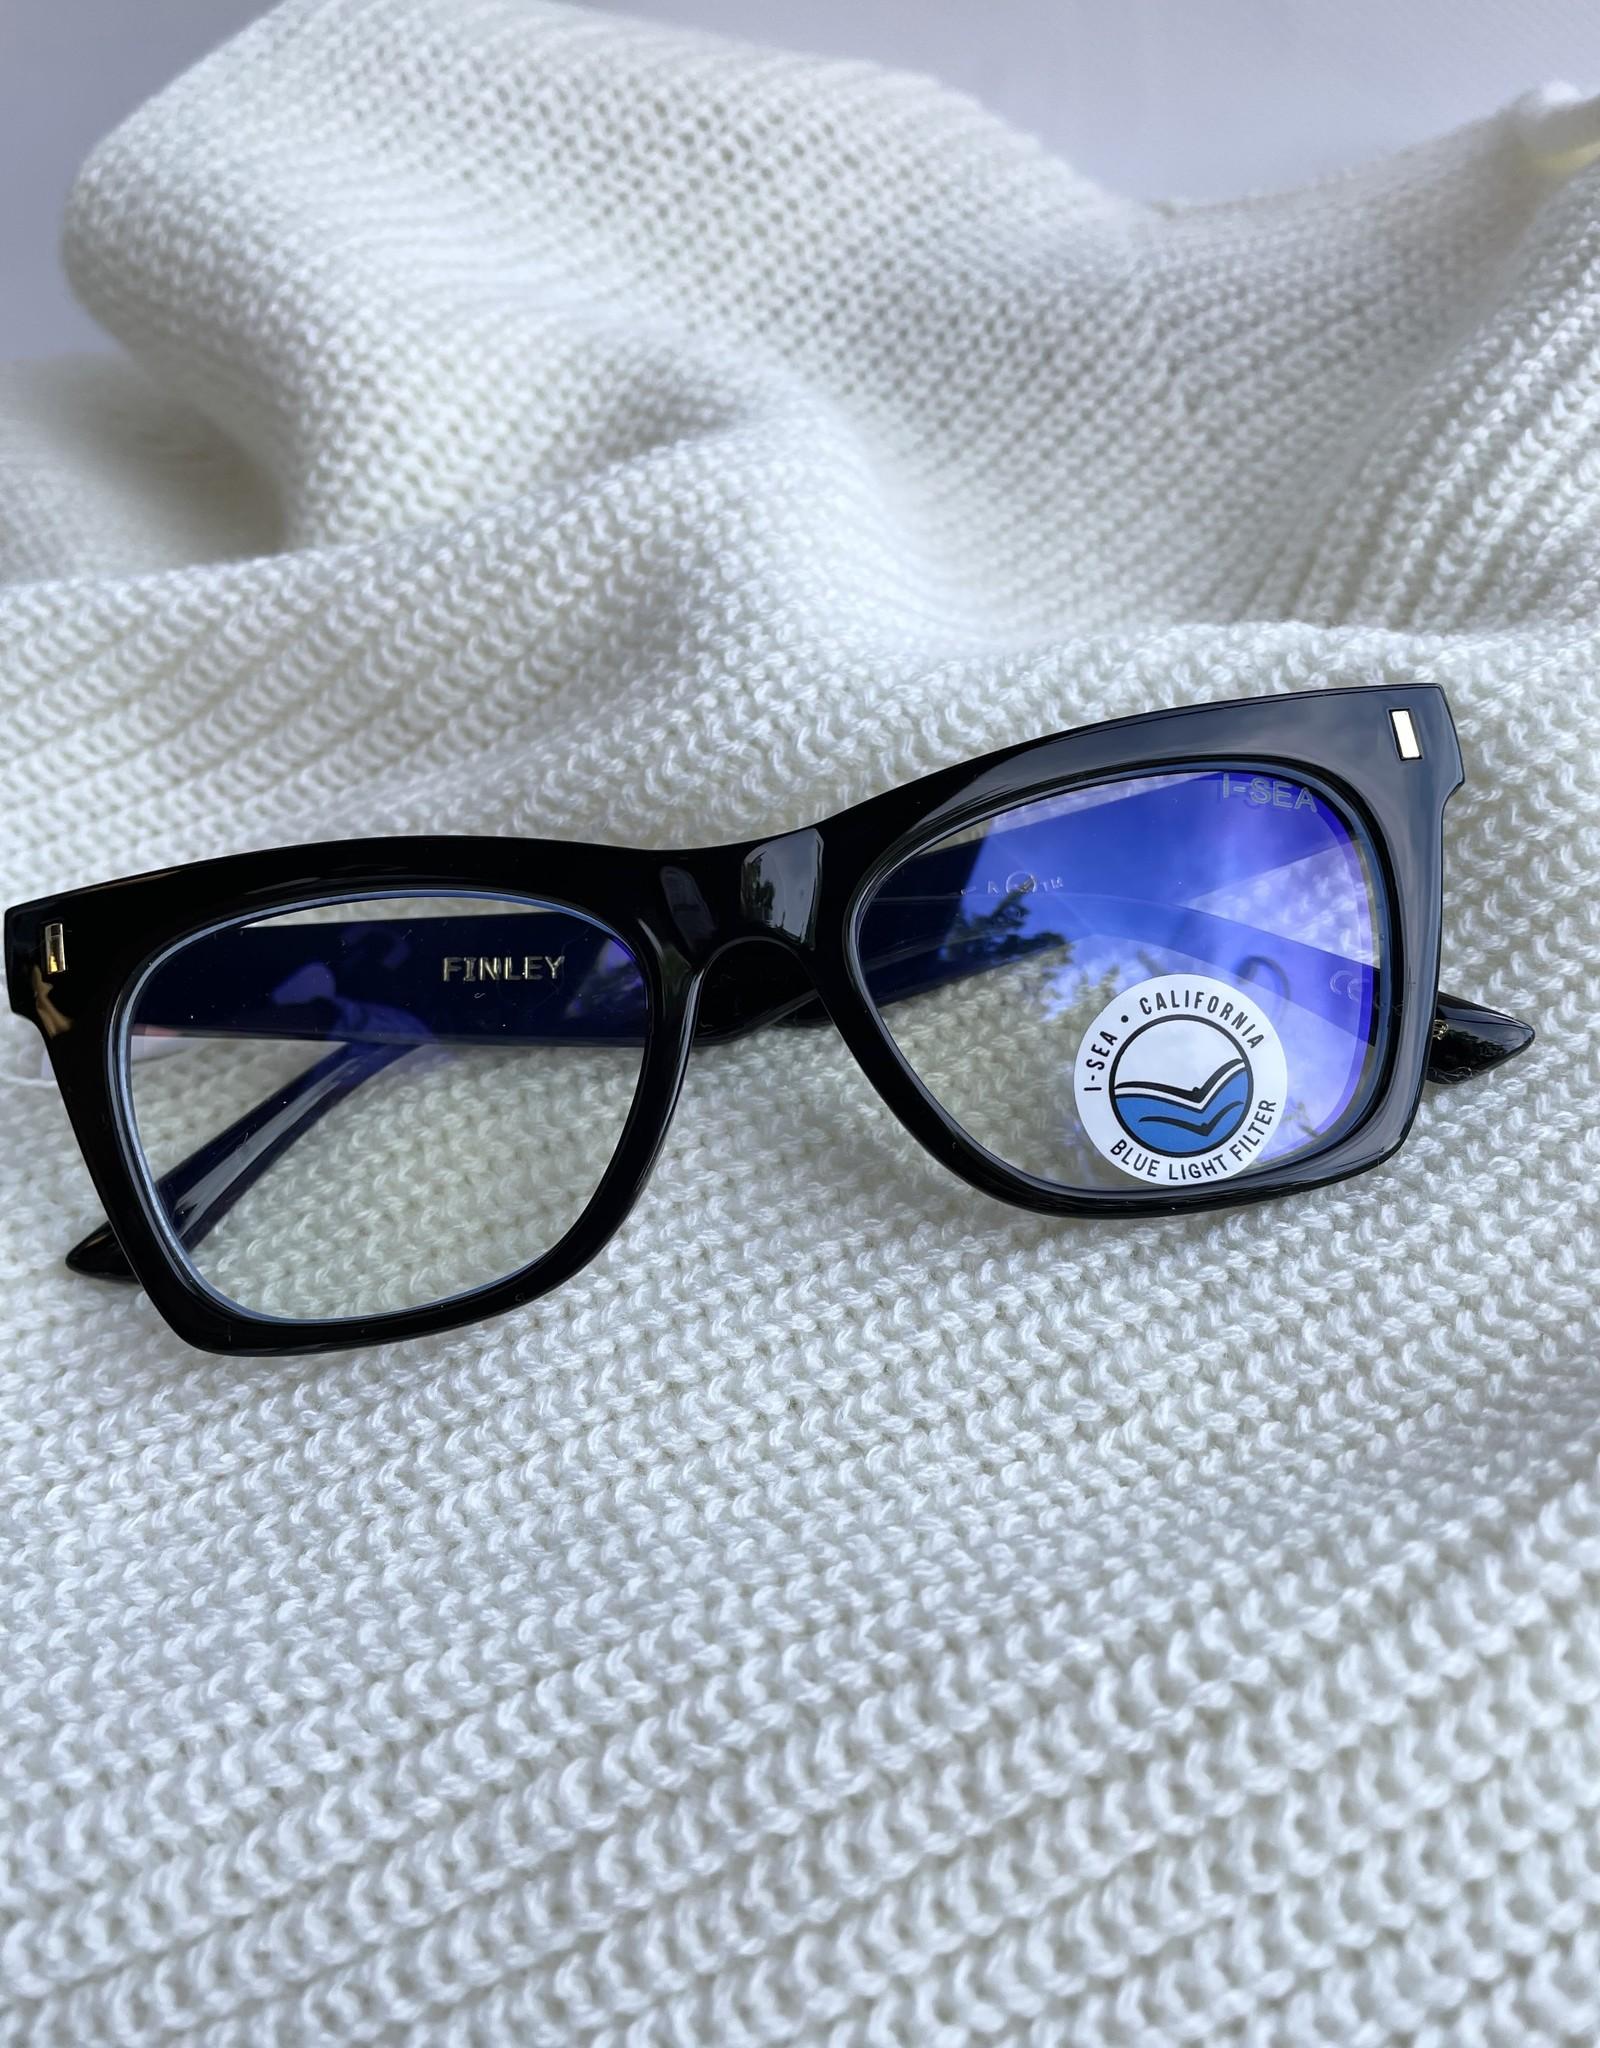 I SEA Finley Blue Light Glasses